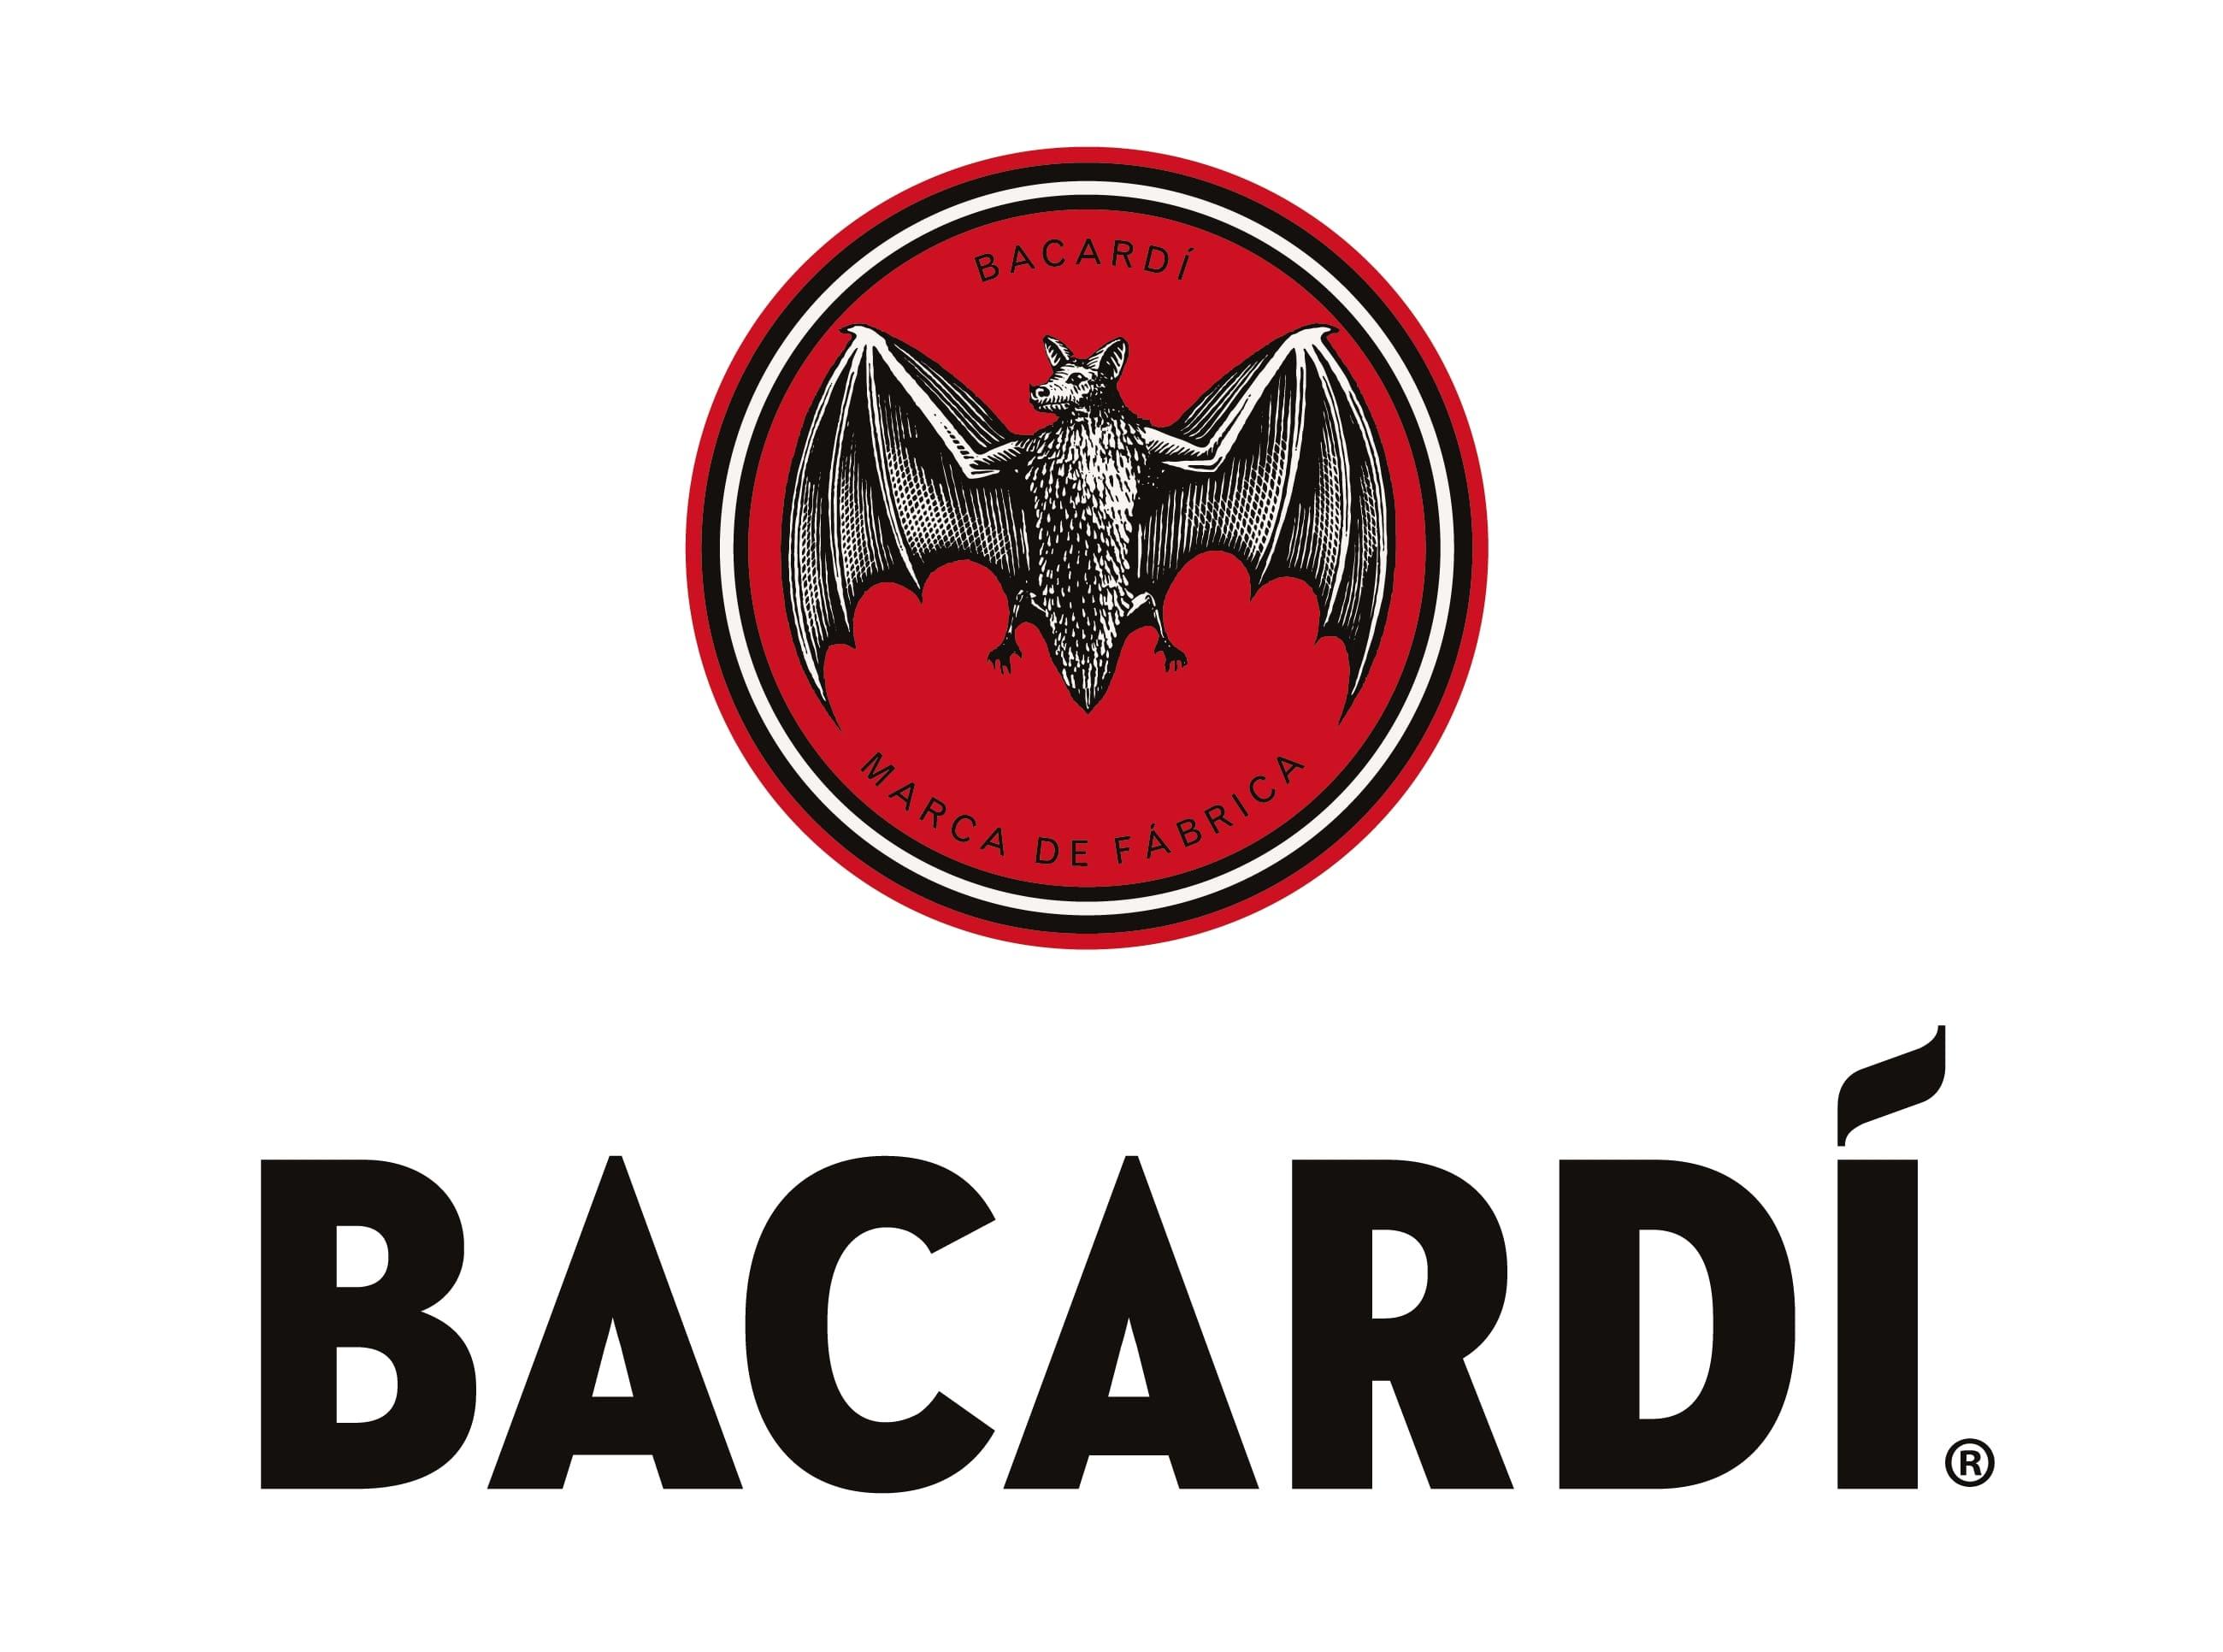 7_Bacardi-logo